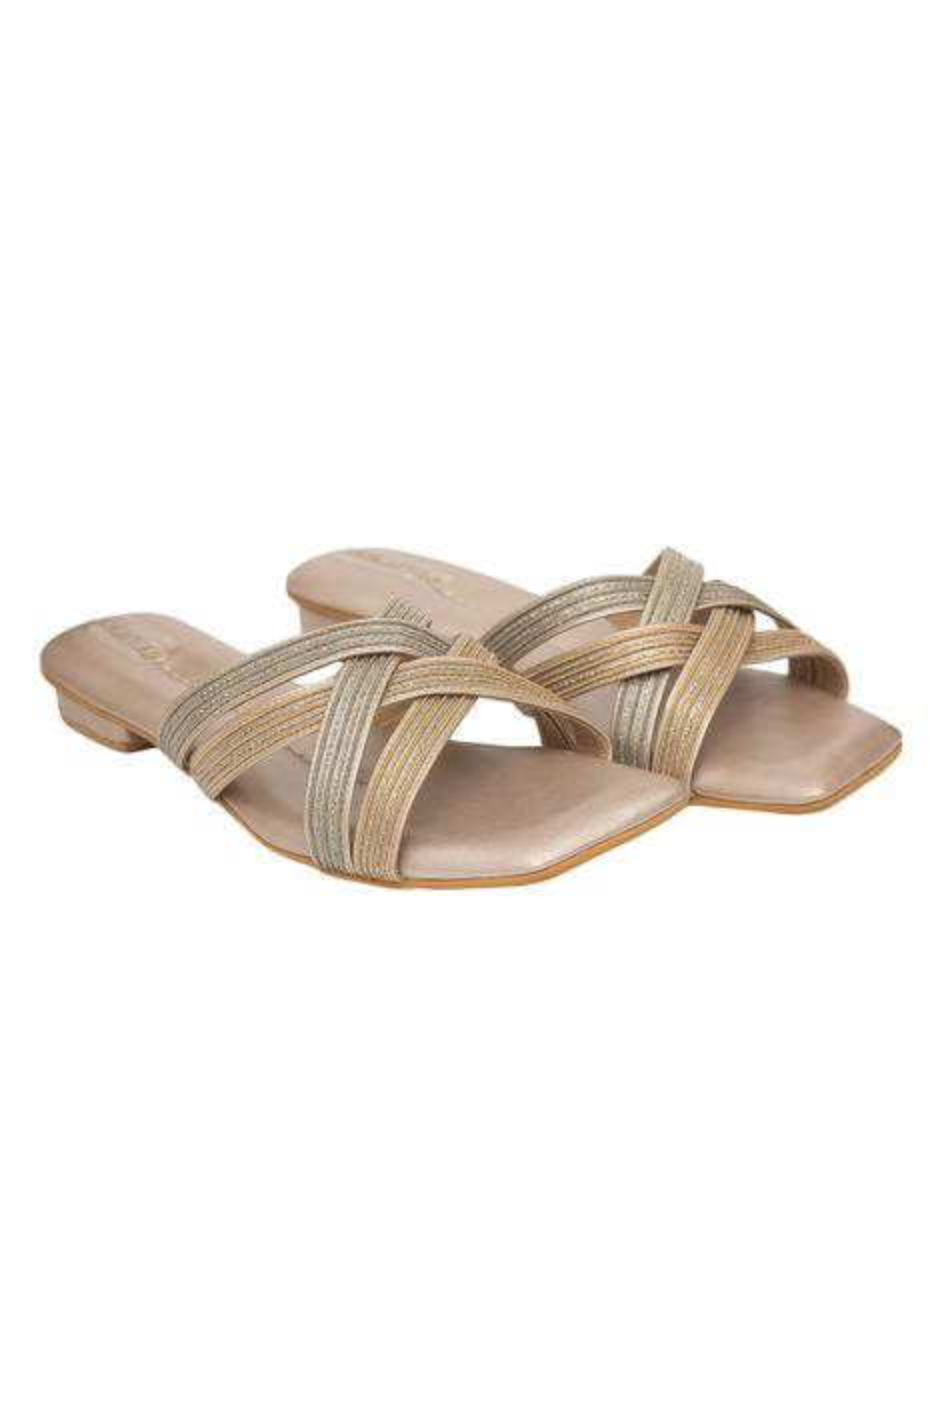 Shabab Cross Strap Sandals